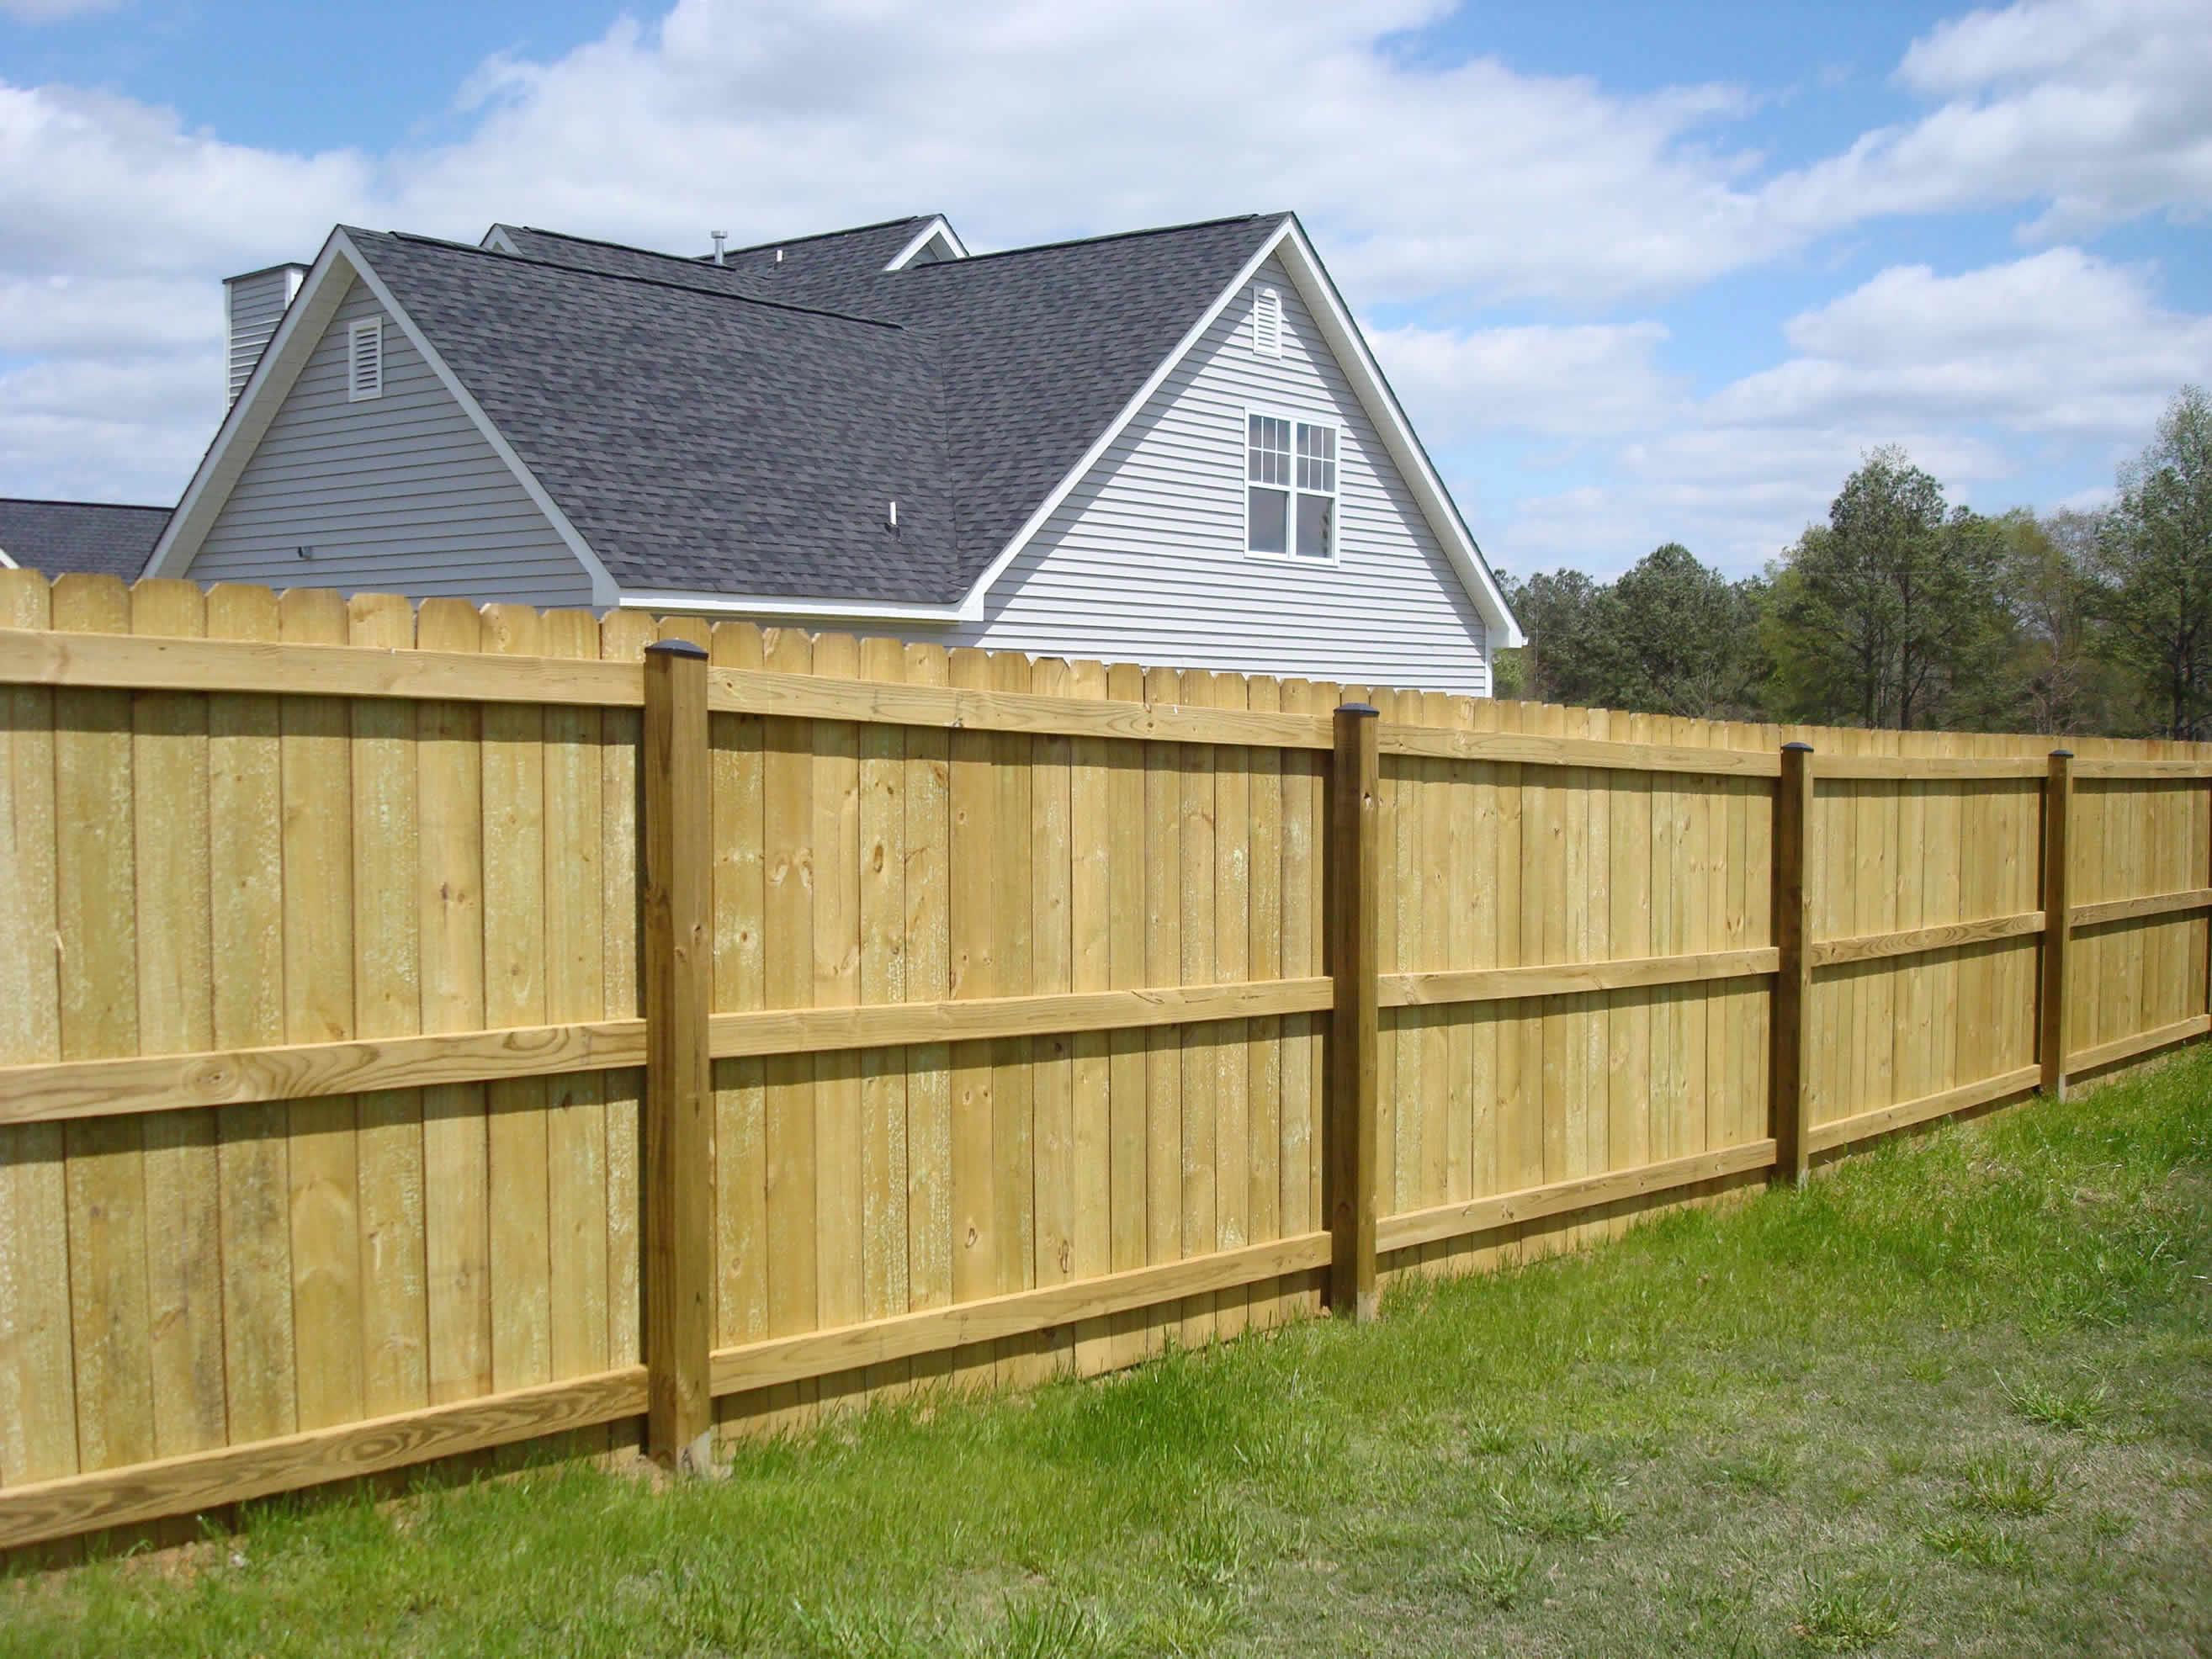 Residential Wood Fencing Birmingham AL | AllSteel Fence